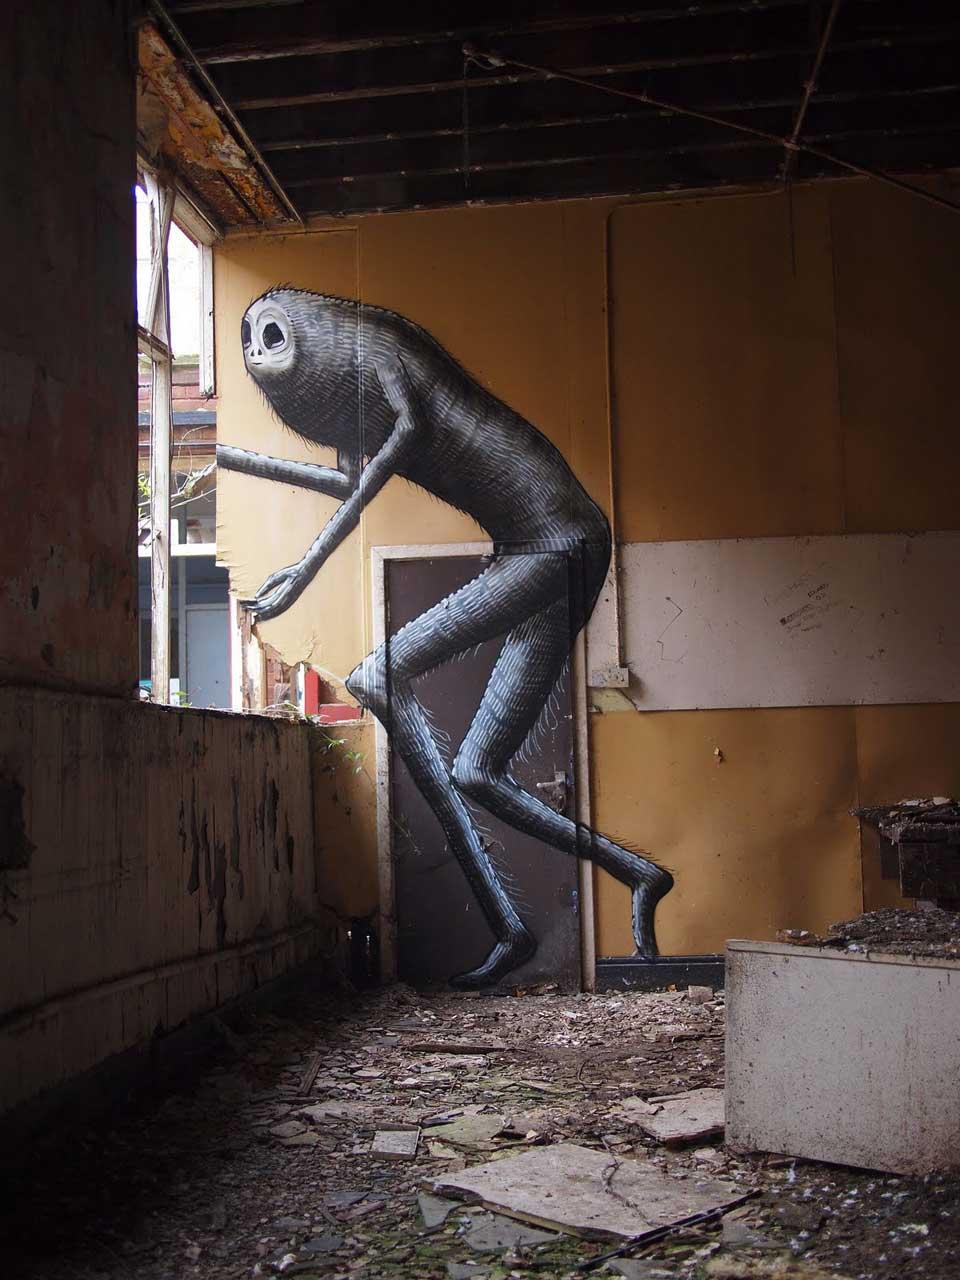 phlegm-window-comics-street-art